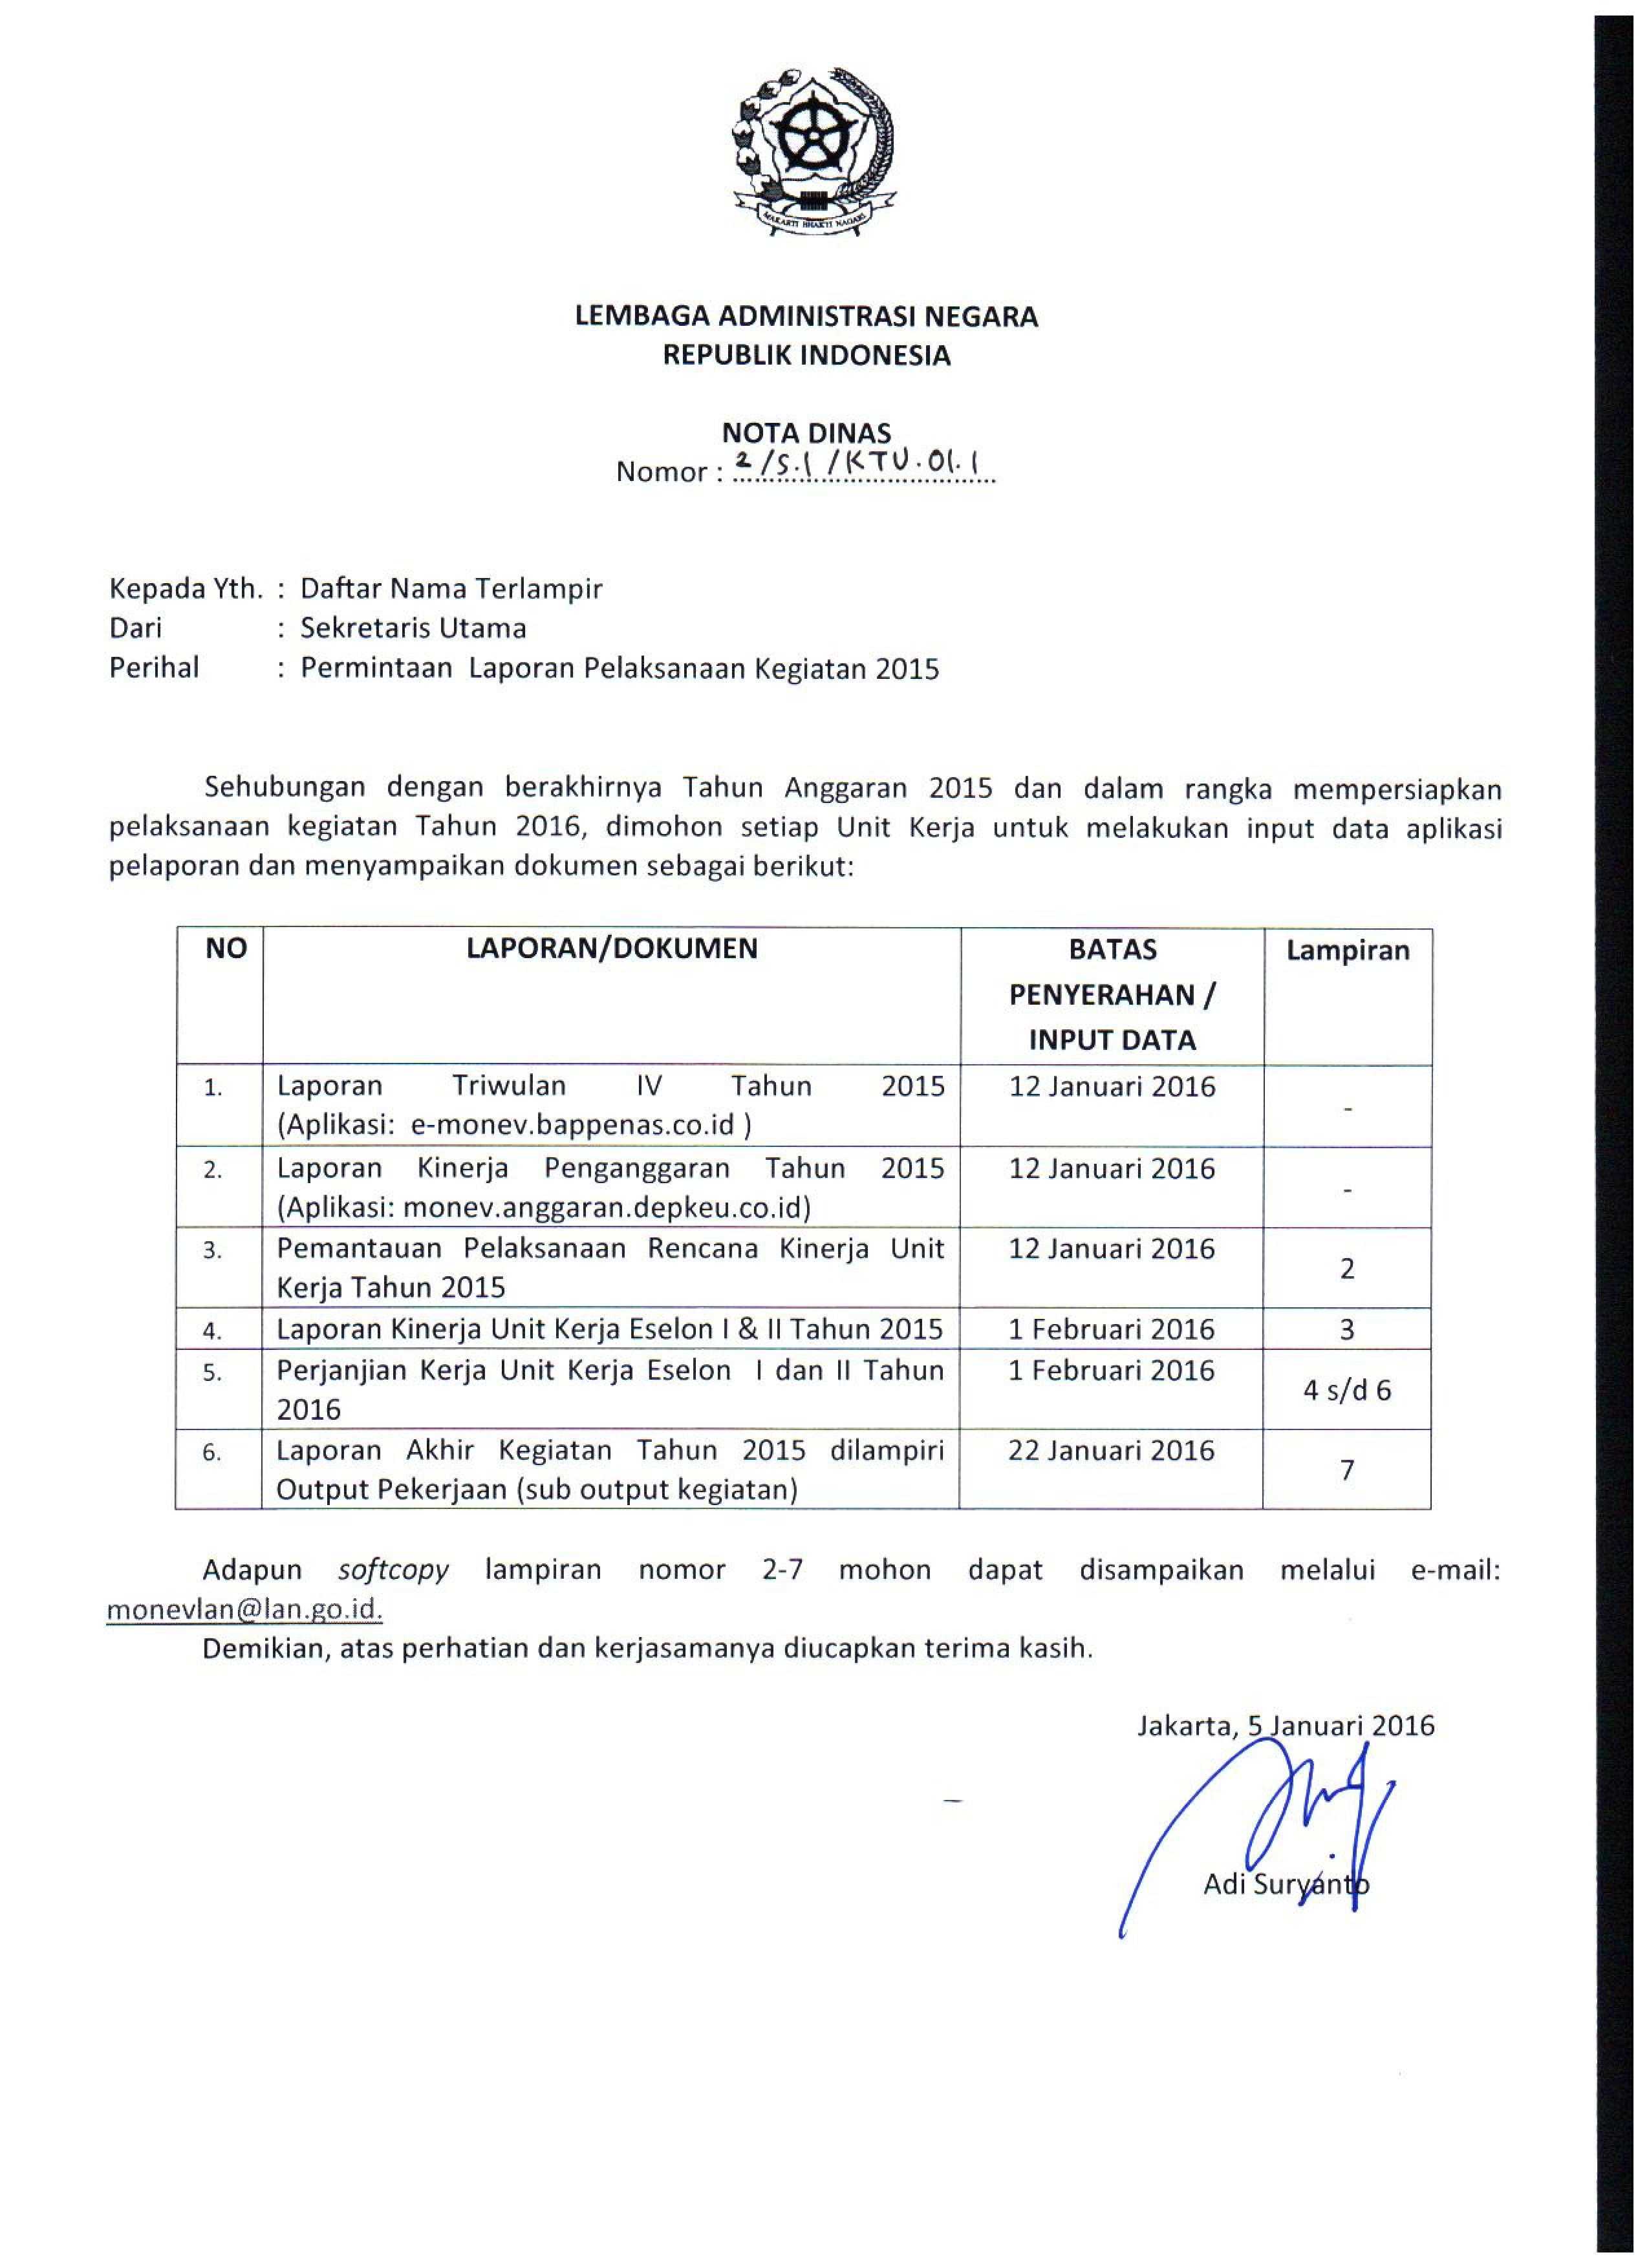 Nota Dinas Pengumpulan Laporan Akhir Beranda Lembaga